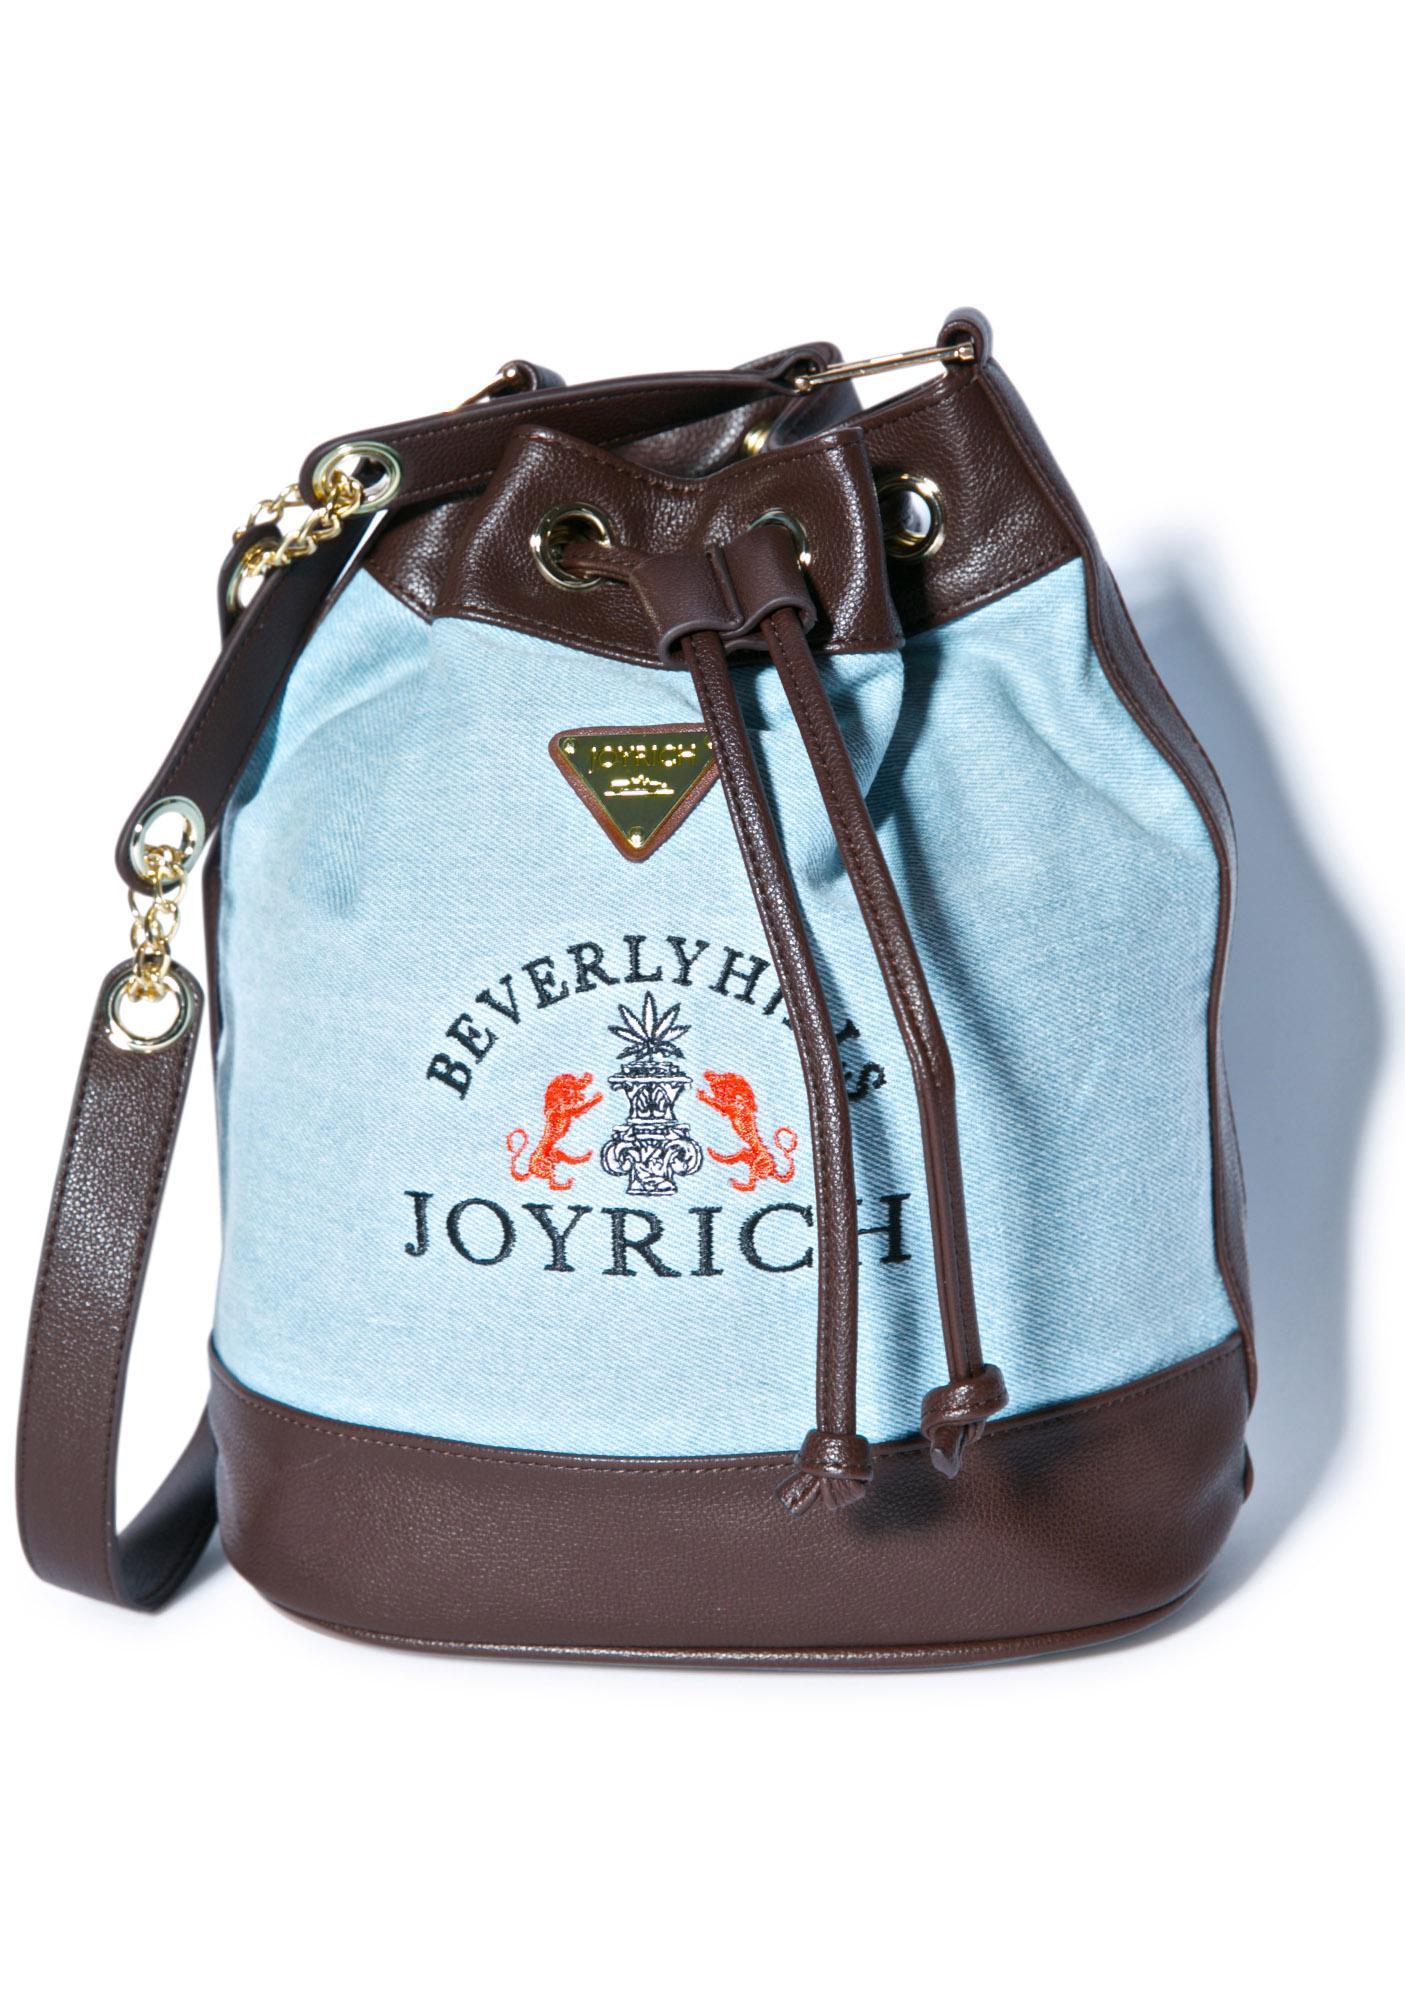 Joyrich High Beverly Hills Denim Bucket Bag